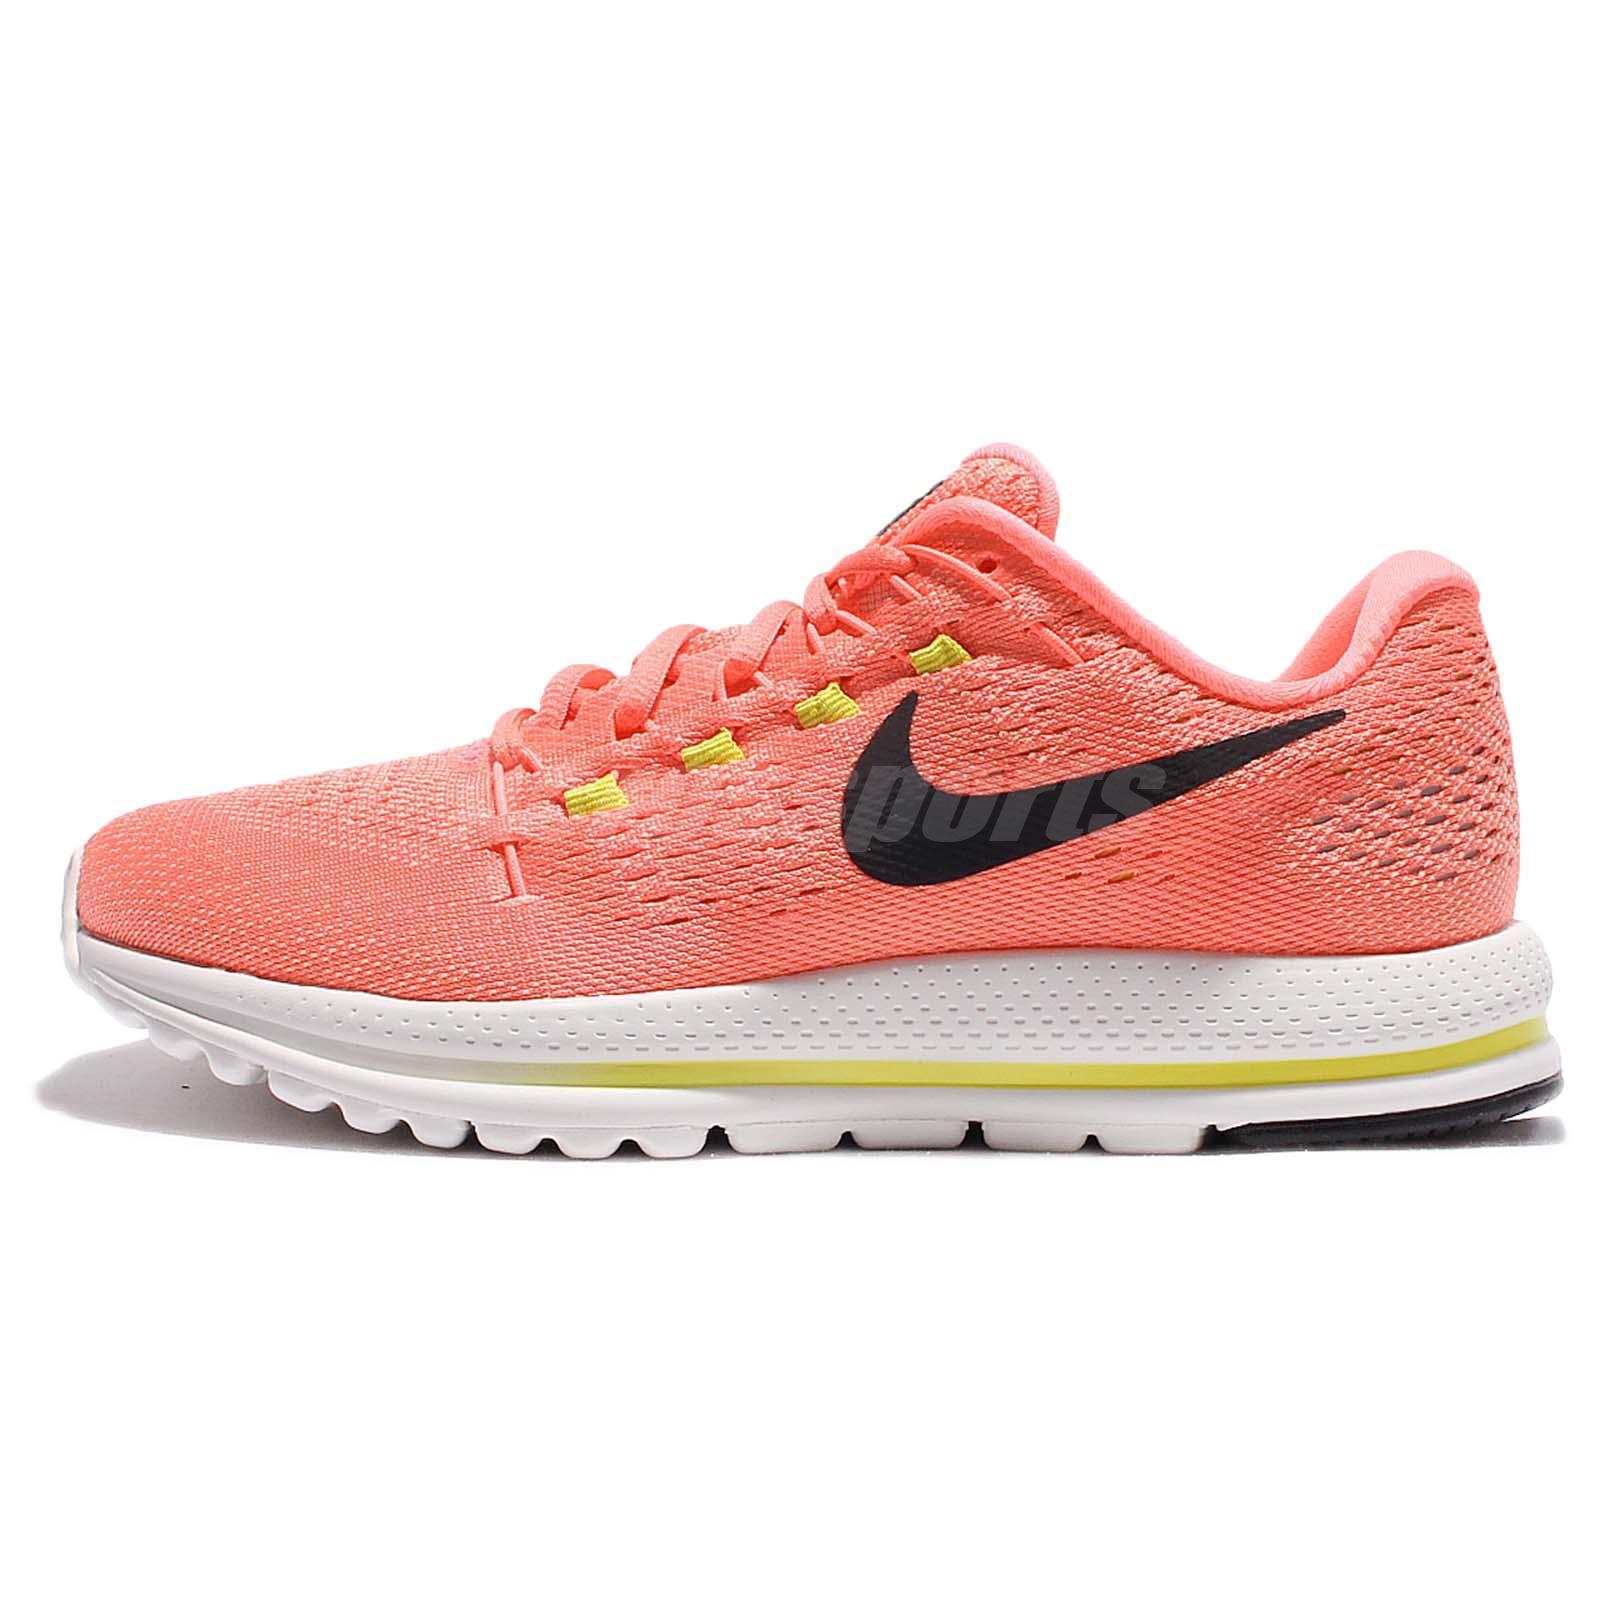 wmns nike air zoom vomero 12 pink black women running shoes sneakers rh ebay com au